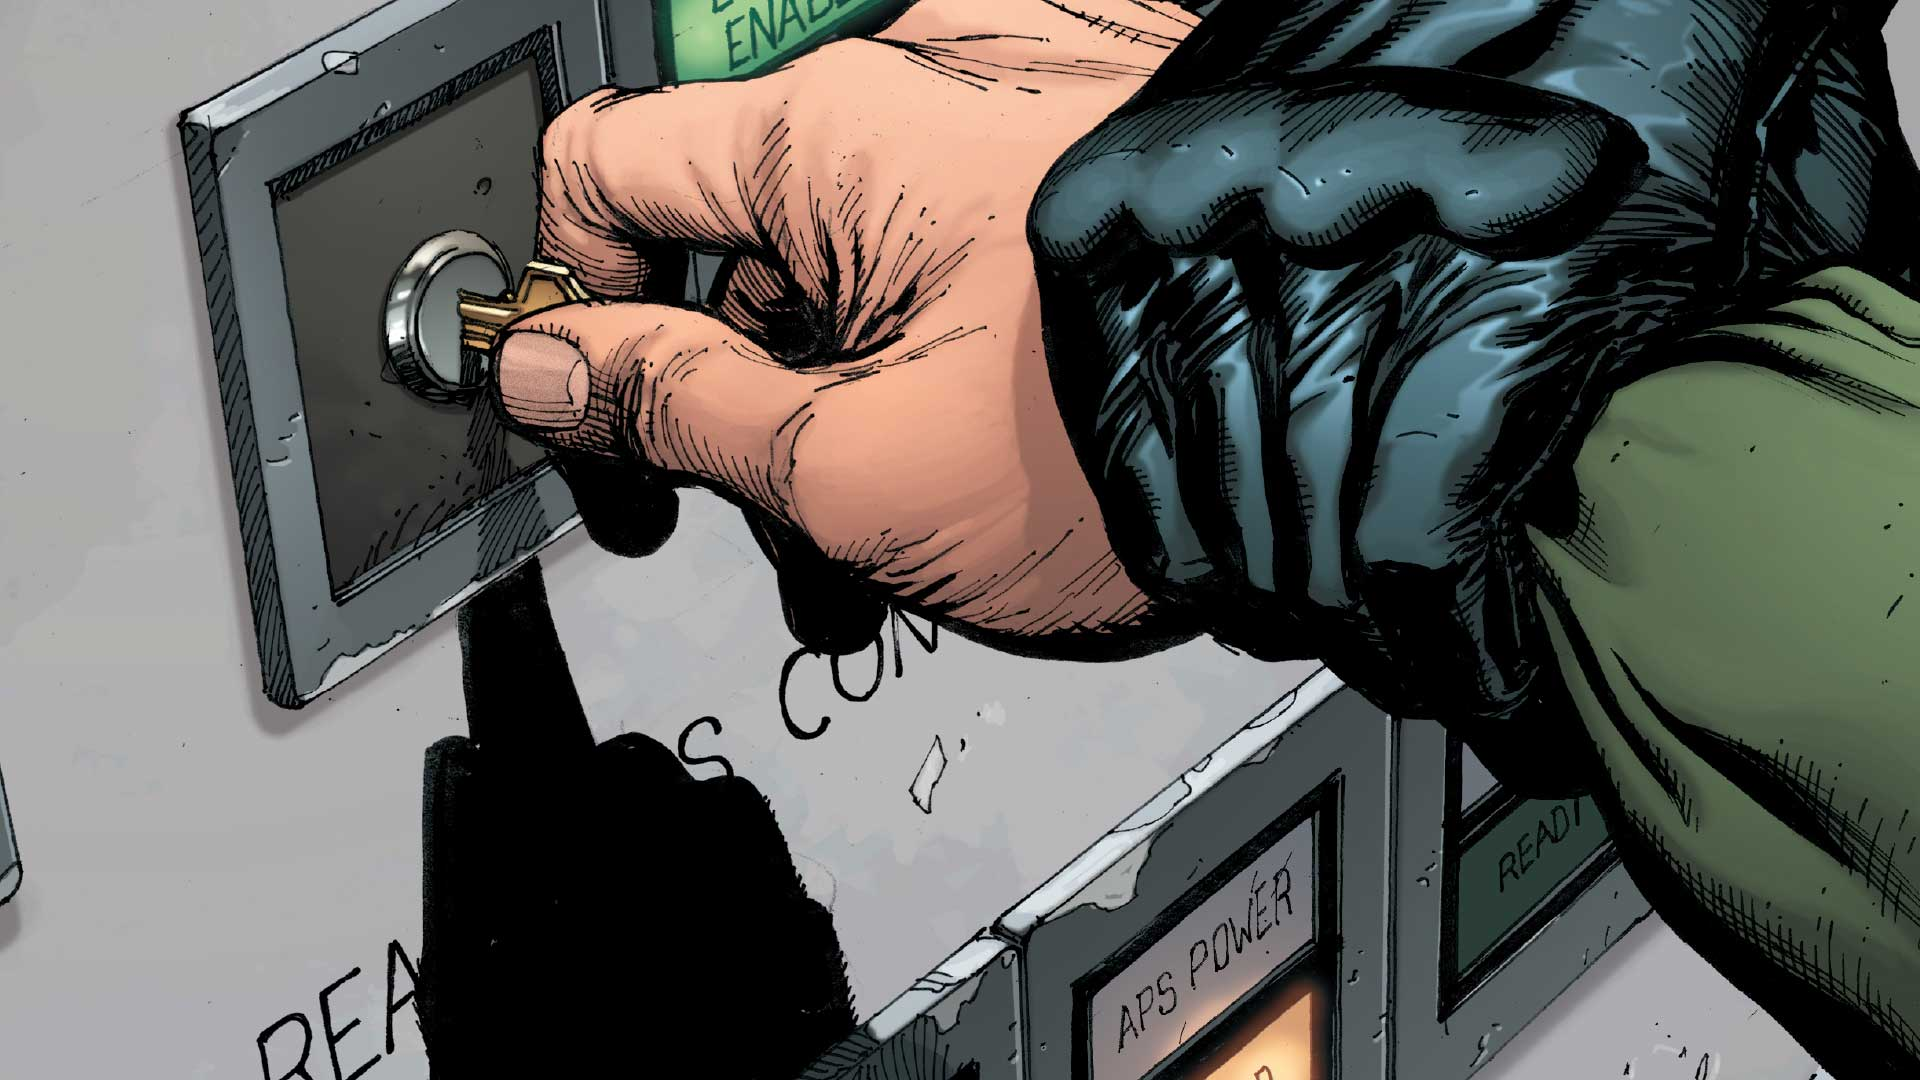 ComicsGallery_DC_20190904__DD_CLOCK_Cv11_ds_c1_c4_5d65cd4882b9b2.73887746.jpg